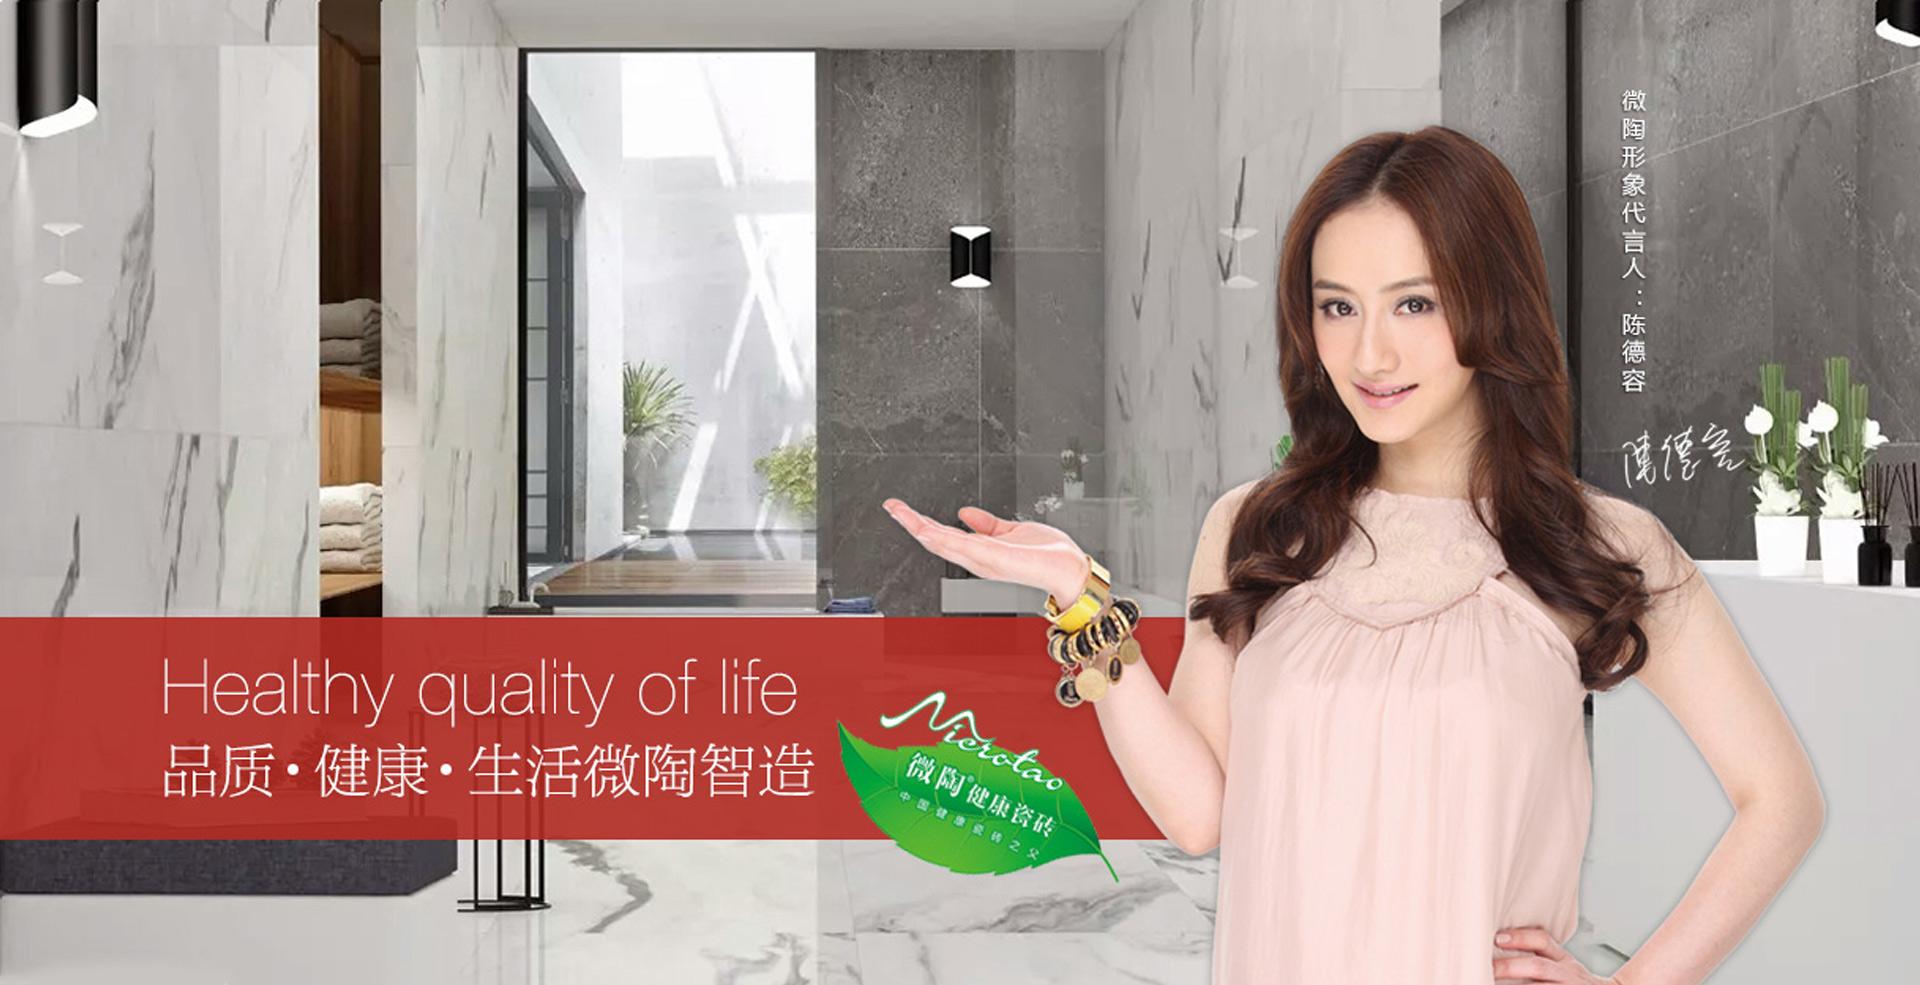 http://ename.hk.ymsm.cc/weitao.com/ban/02